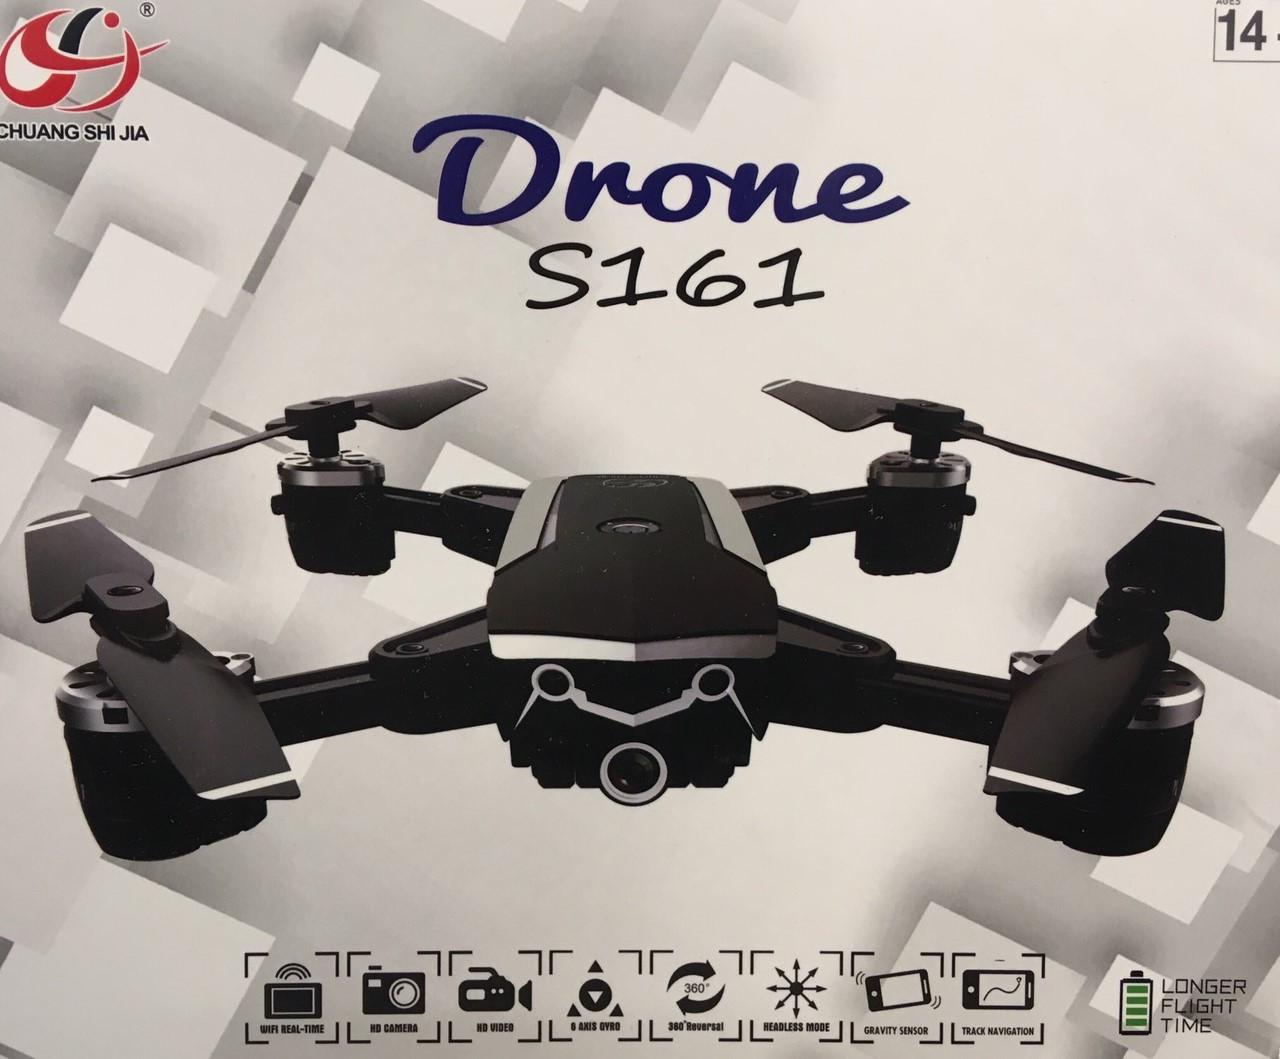 Квадрокоптер Drone S161 с камерой, складной